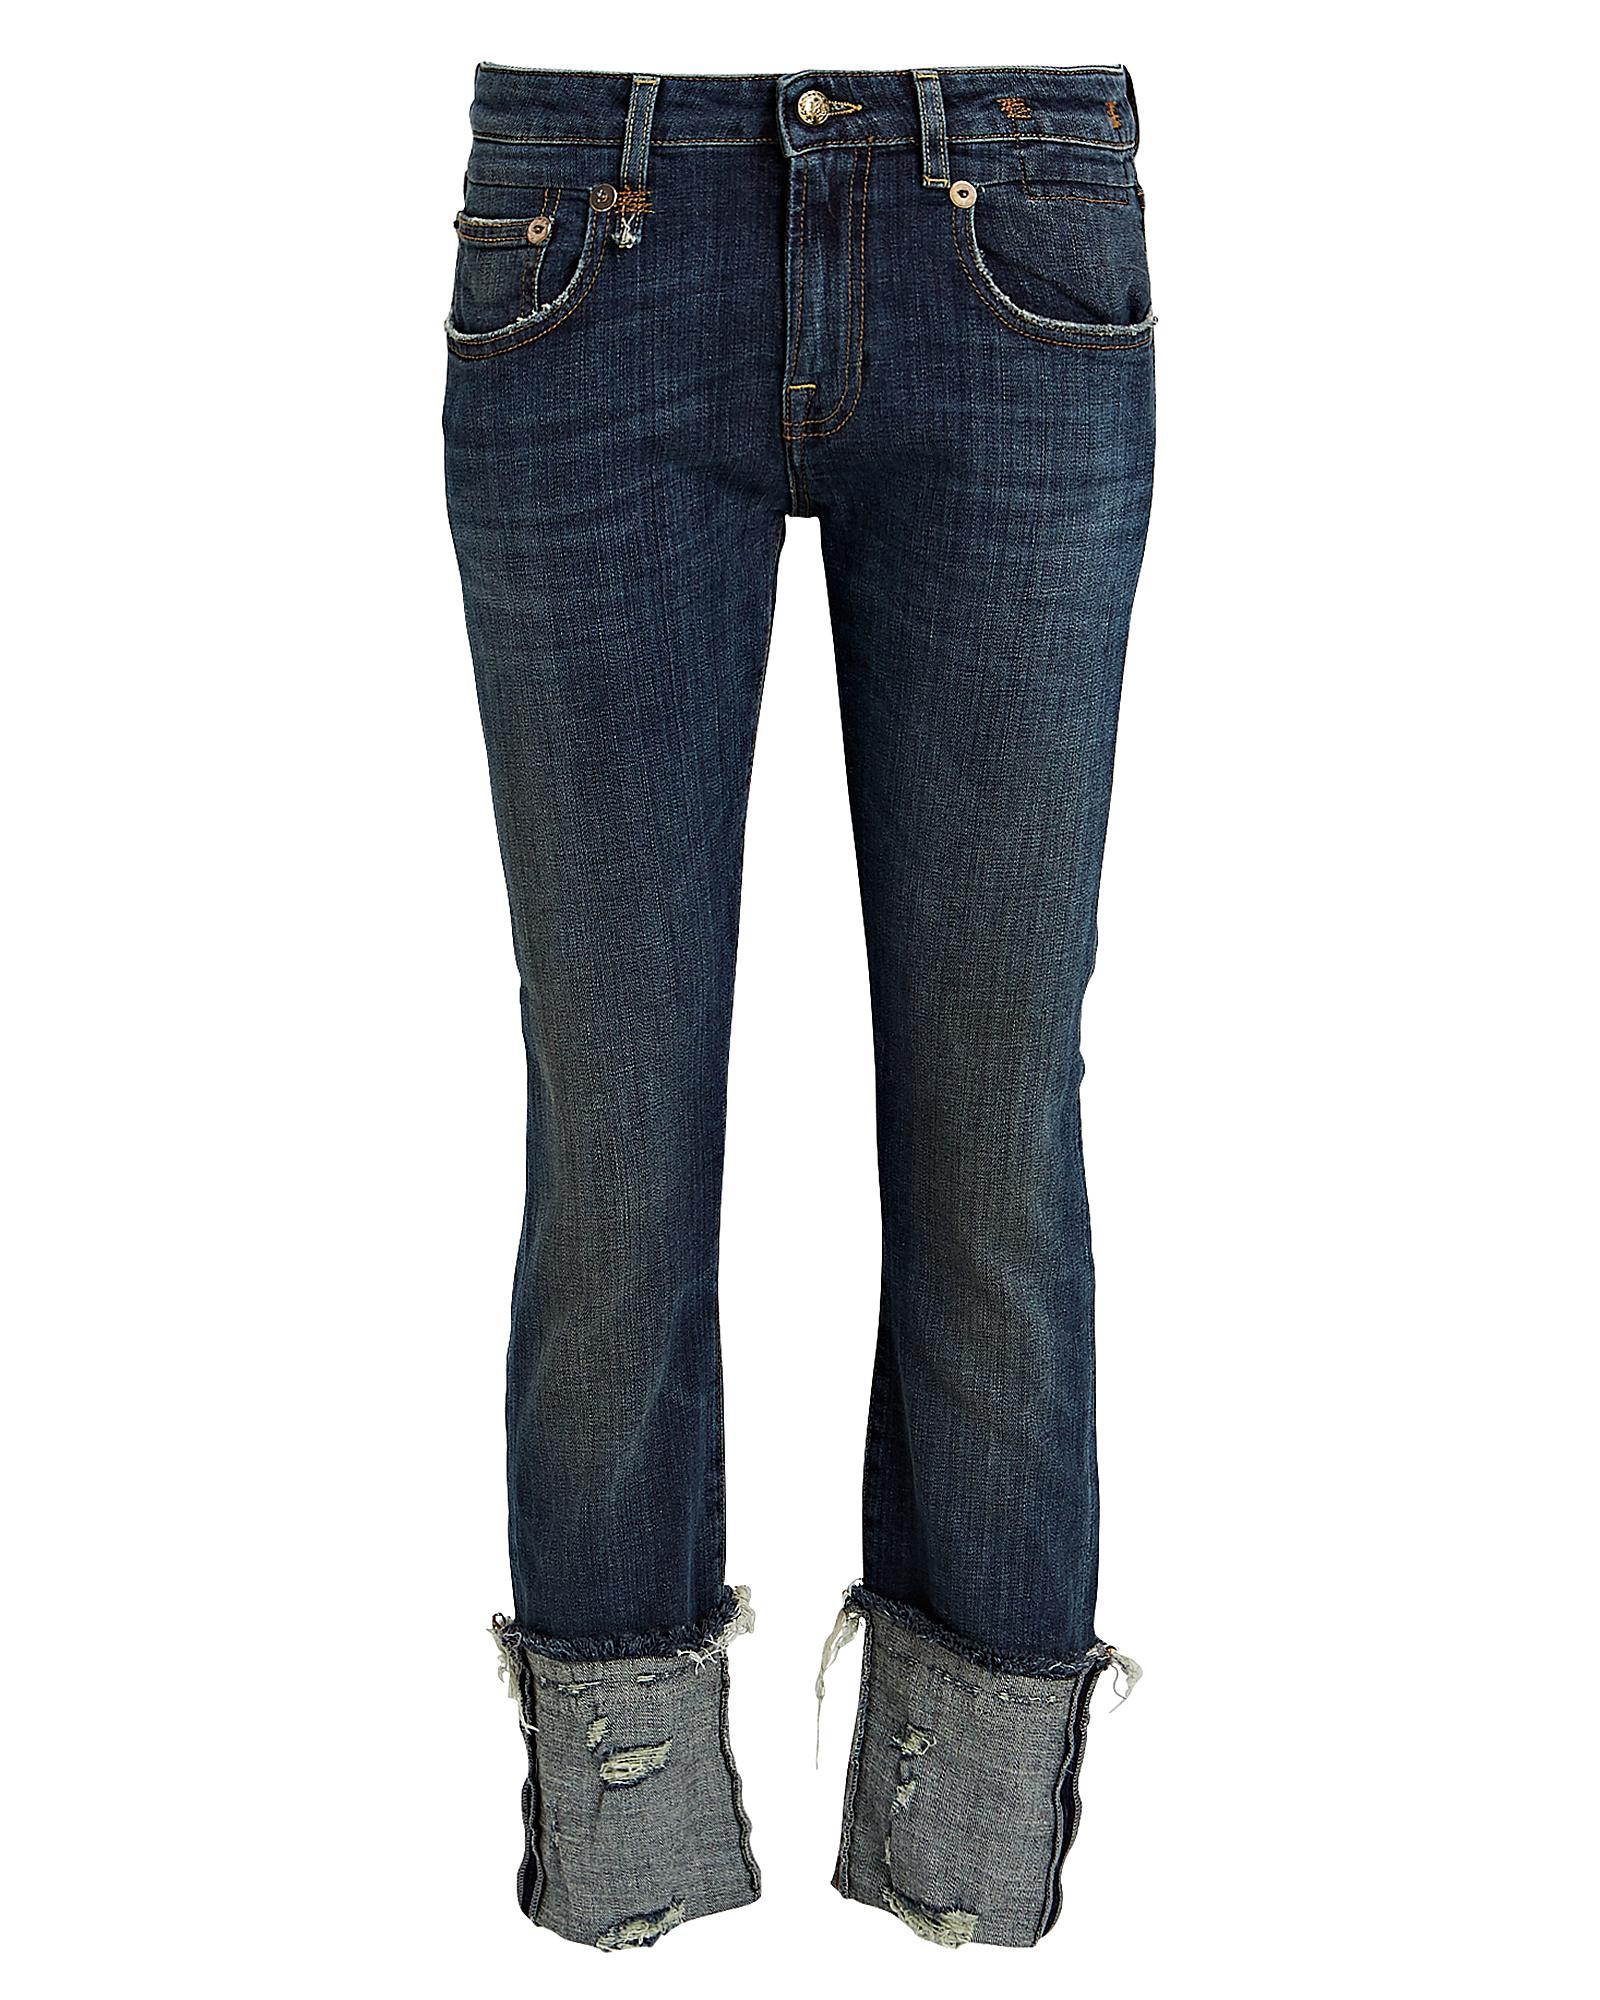 R13 Jeans R13 BOY CUFFED SKINNY JEANS